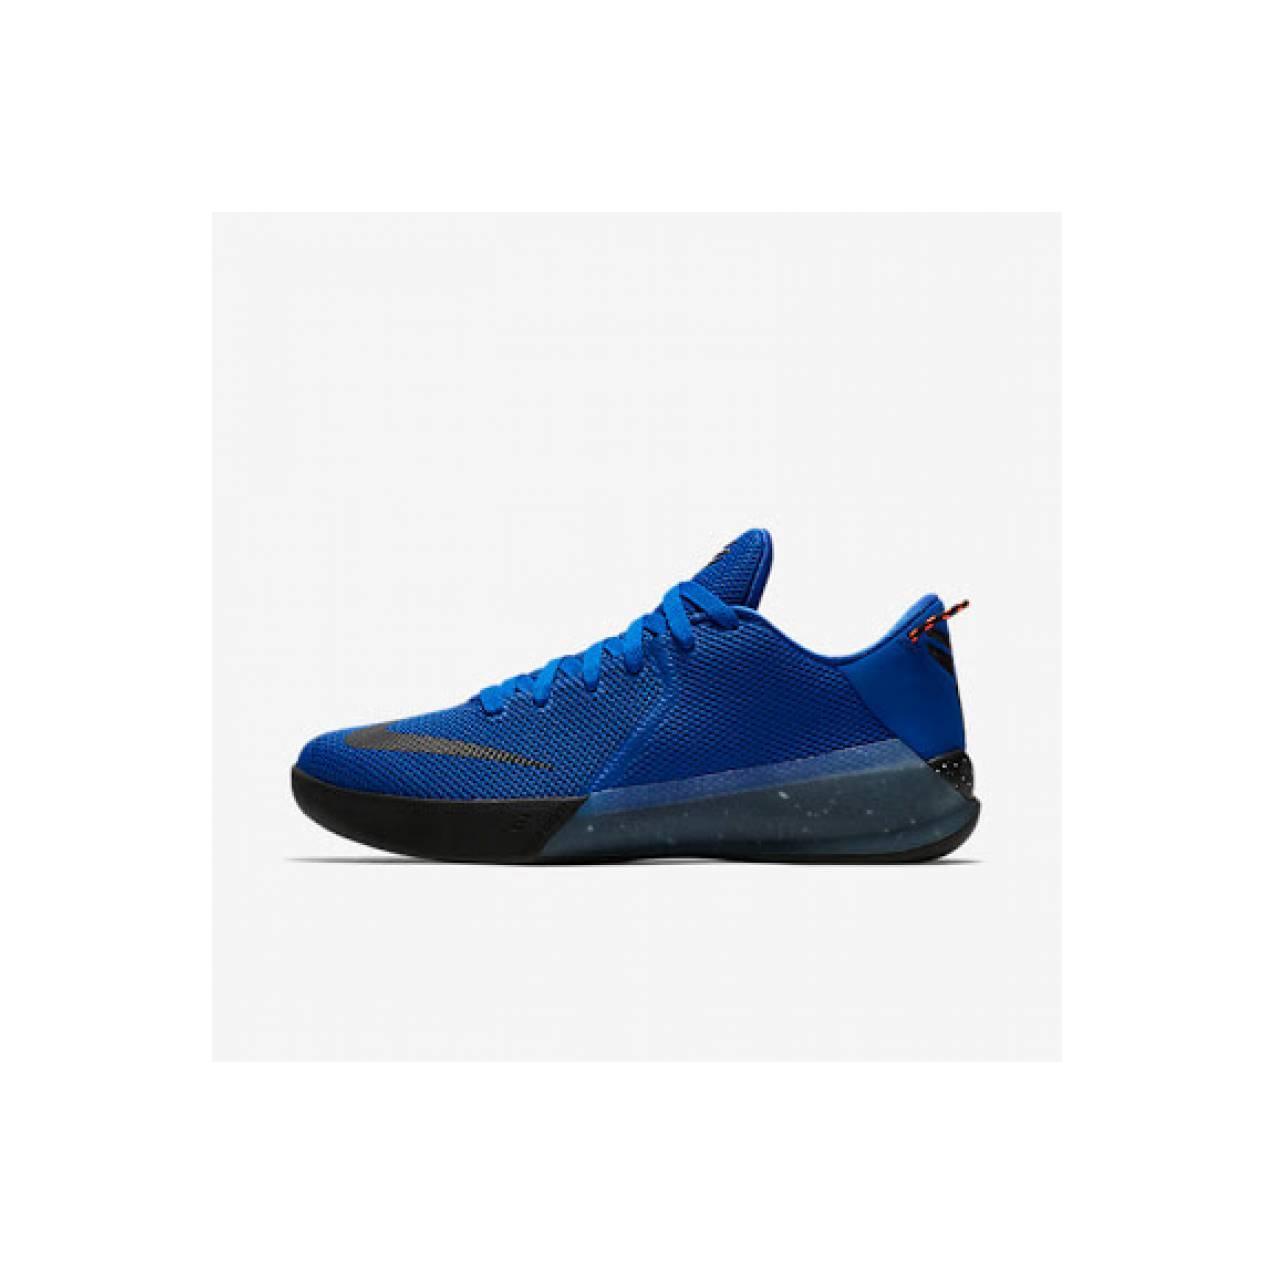 Sepatu Basket NIKE Zoom Kobe Venomenon 6 897656 400 Murah Original